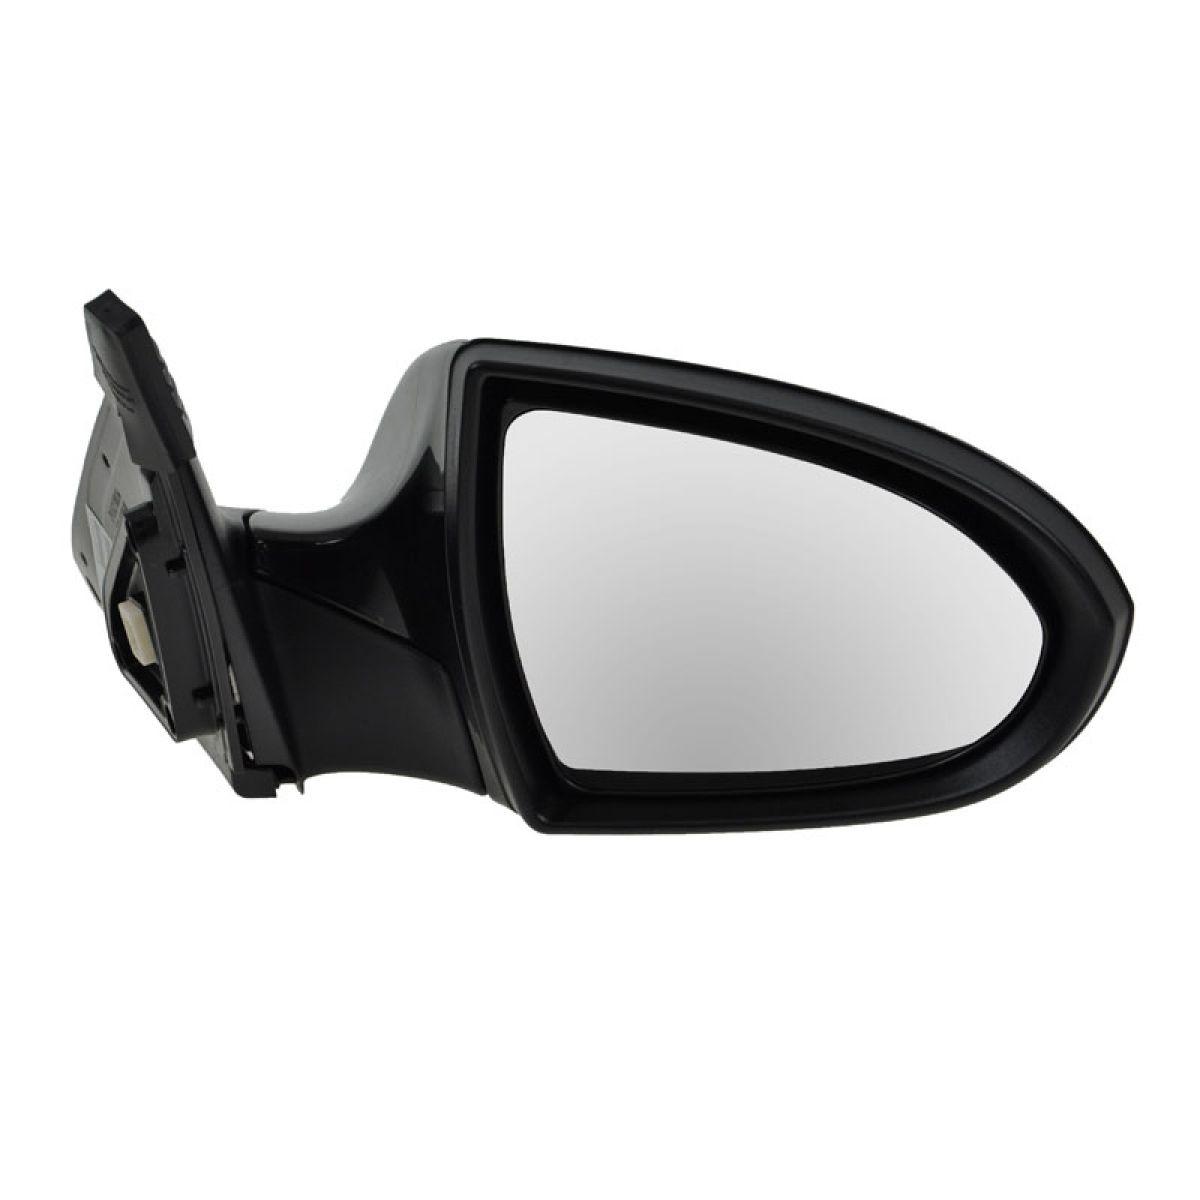 Mirror Power Turn Signal Black Cover LH /& RH Pair Set for Kia Sportage